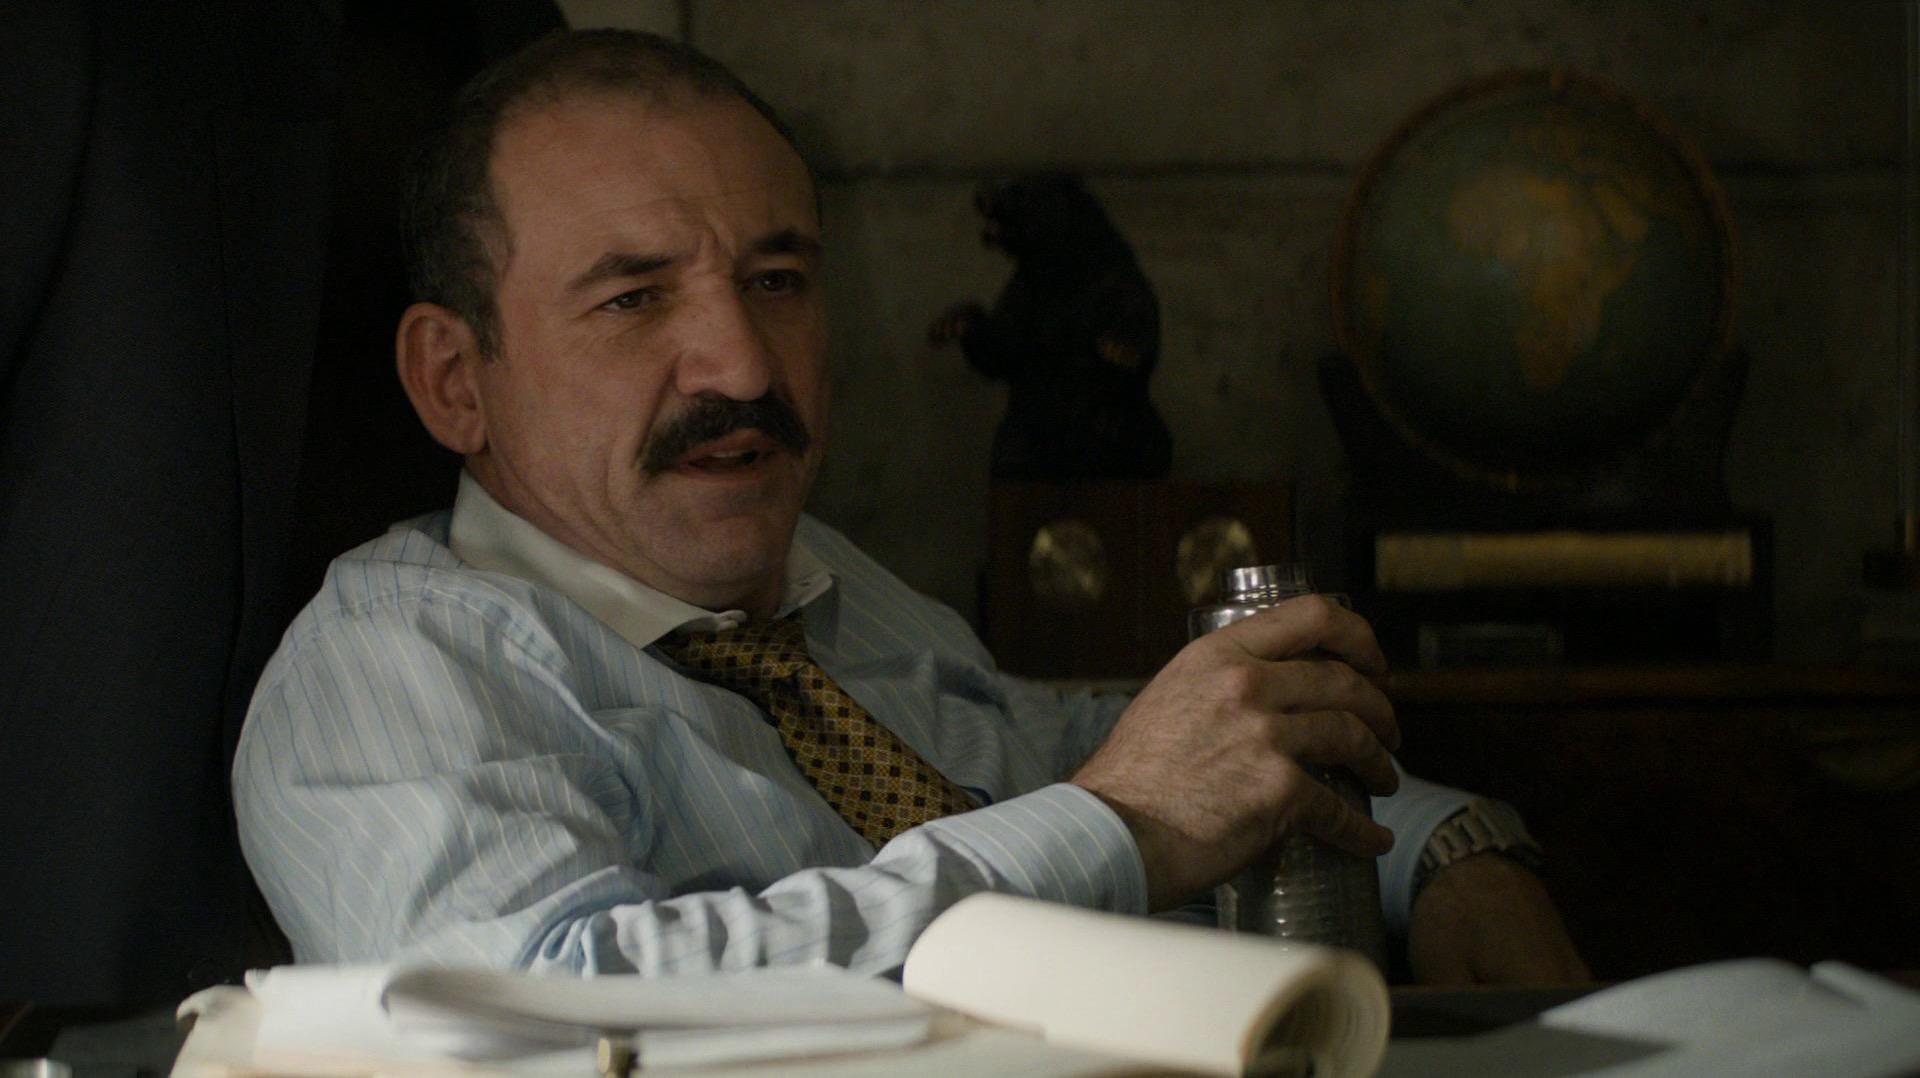 Mayor Chessani drinking at his desk